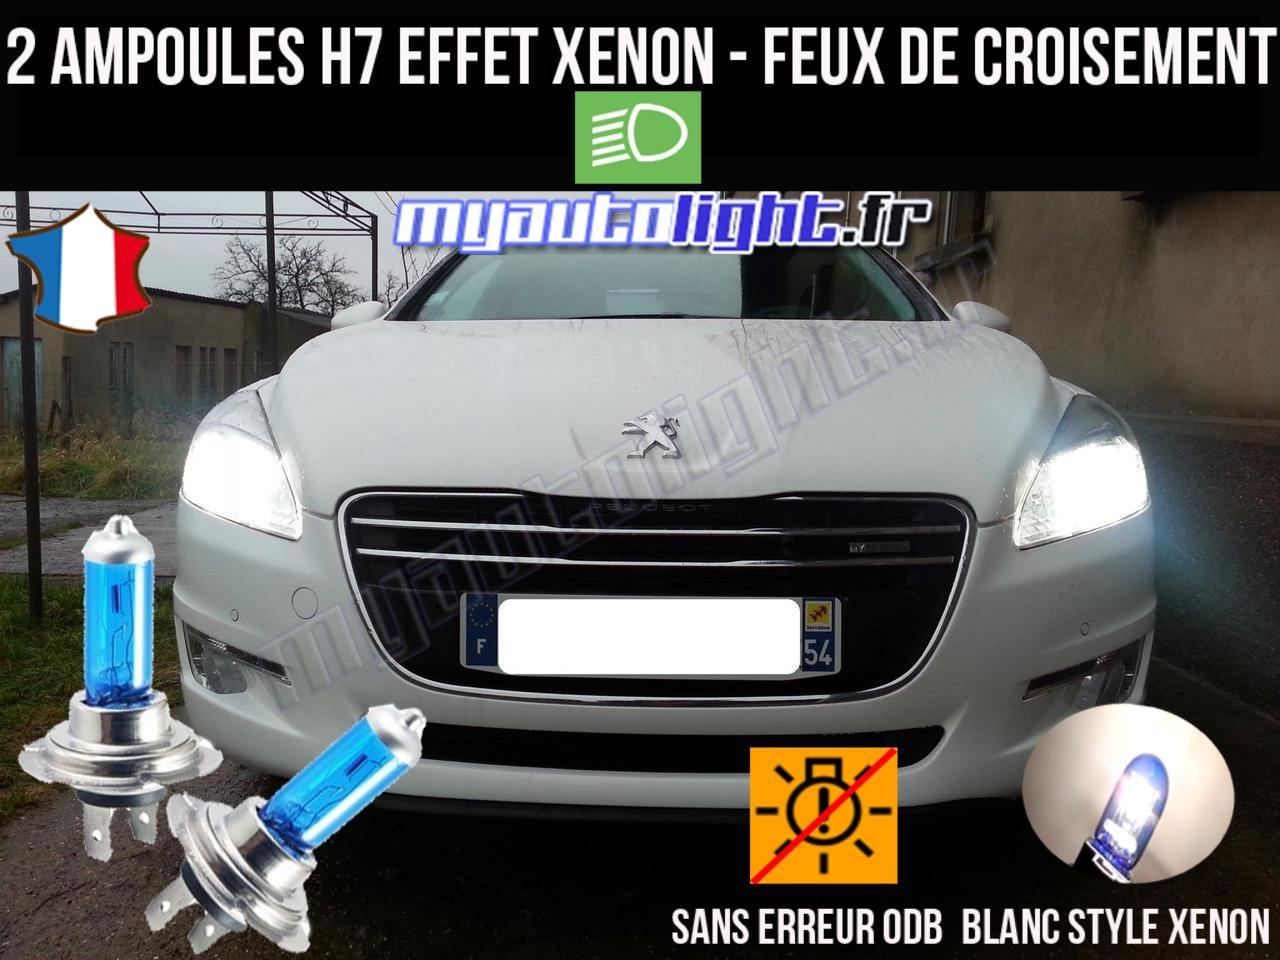 Pack Bombillas H7 blanco Xenon luz croisement-code para Peugeot 508: Amazon.es: Coche y moto